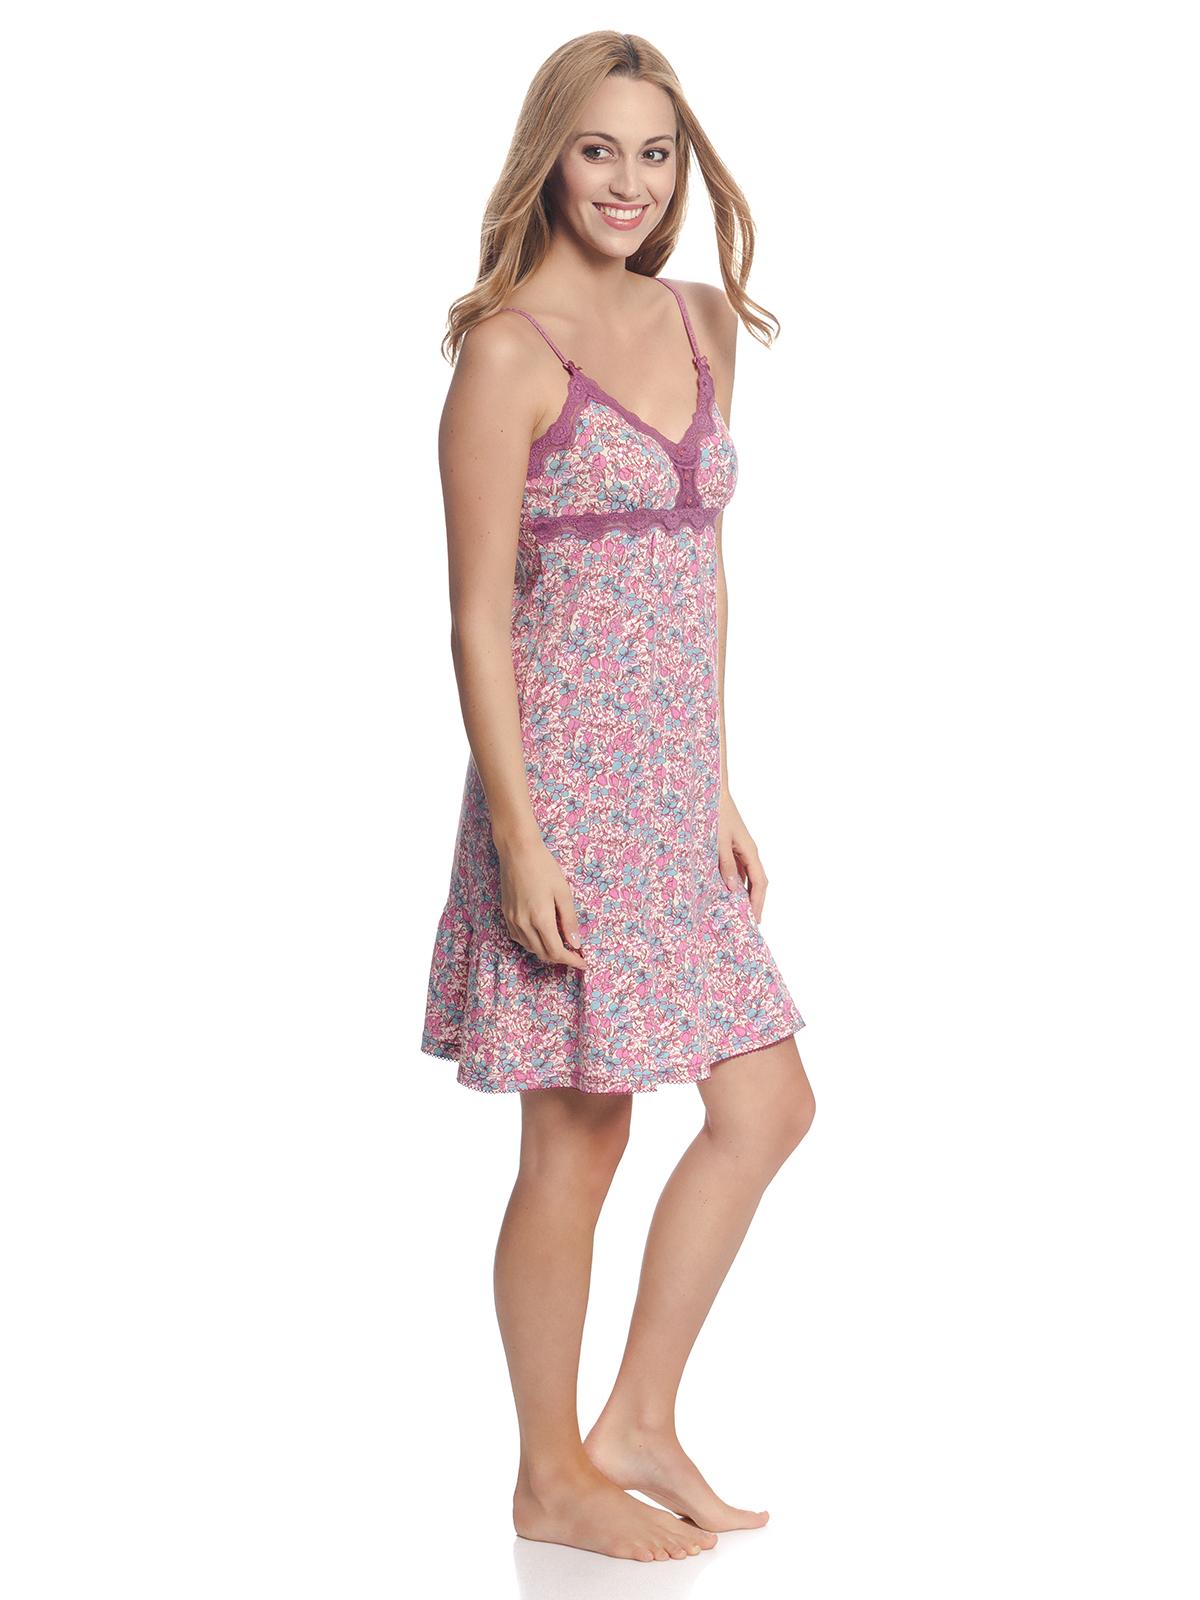 Vive Maria Lollipop Girl Negligée Pink Allover